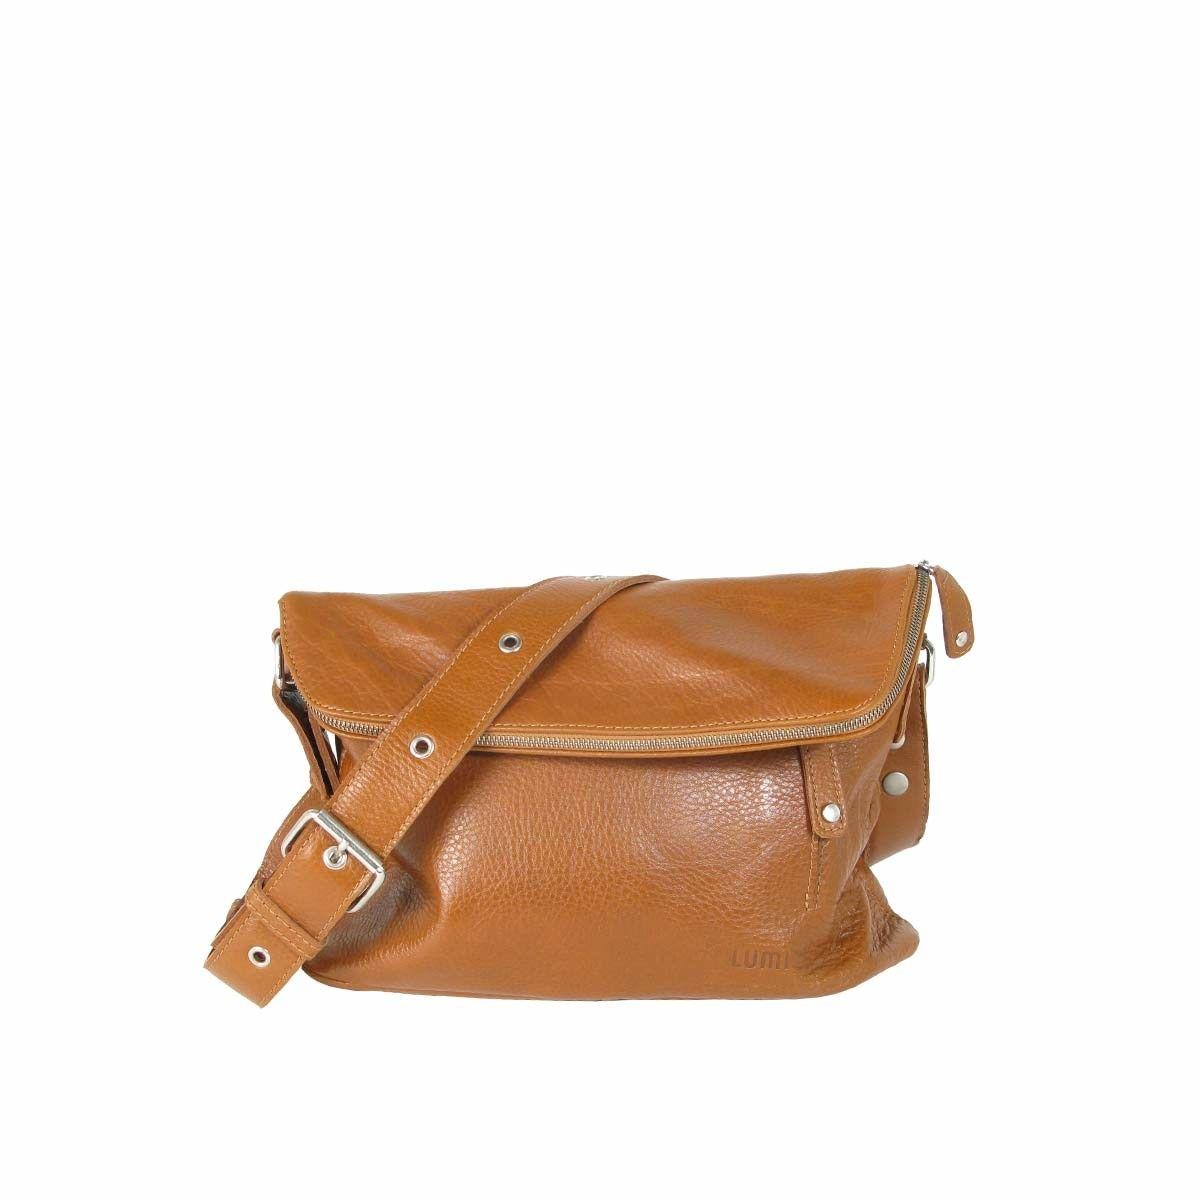 Tomi Small Messenger Bag Honey Color  0c46d5df89